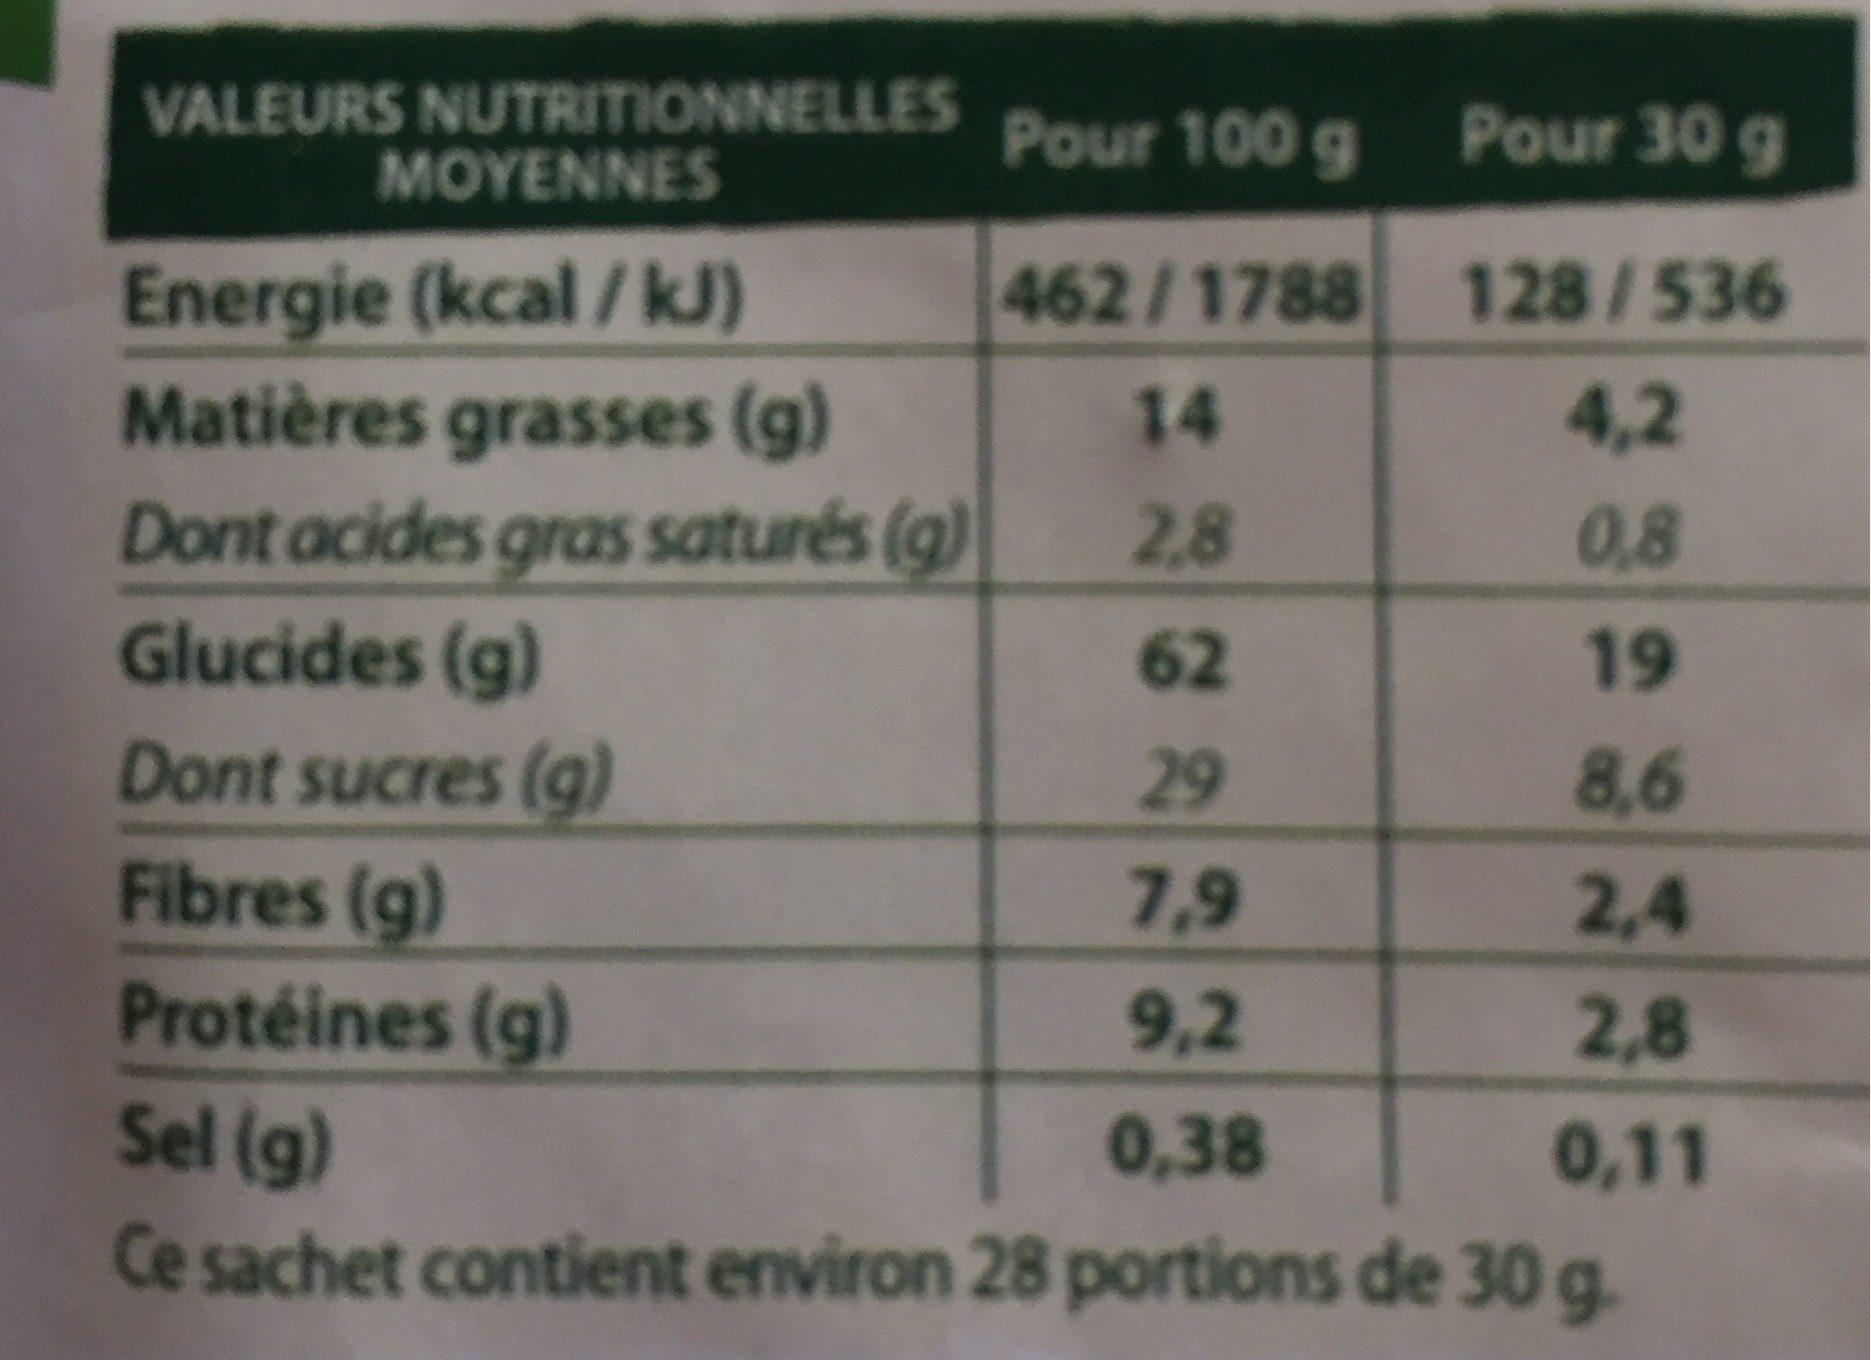 CROSTI COEUR FONDANT CHOCO NOISETTES - Voedingswaarden